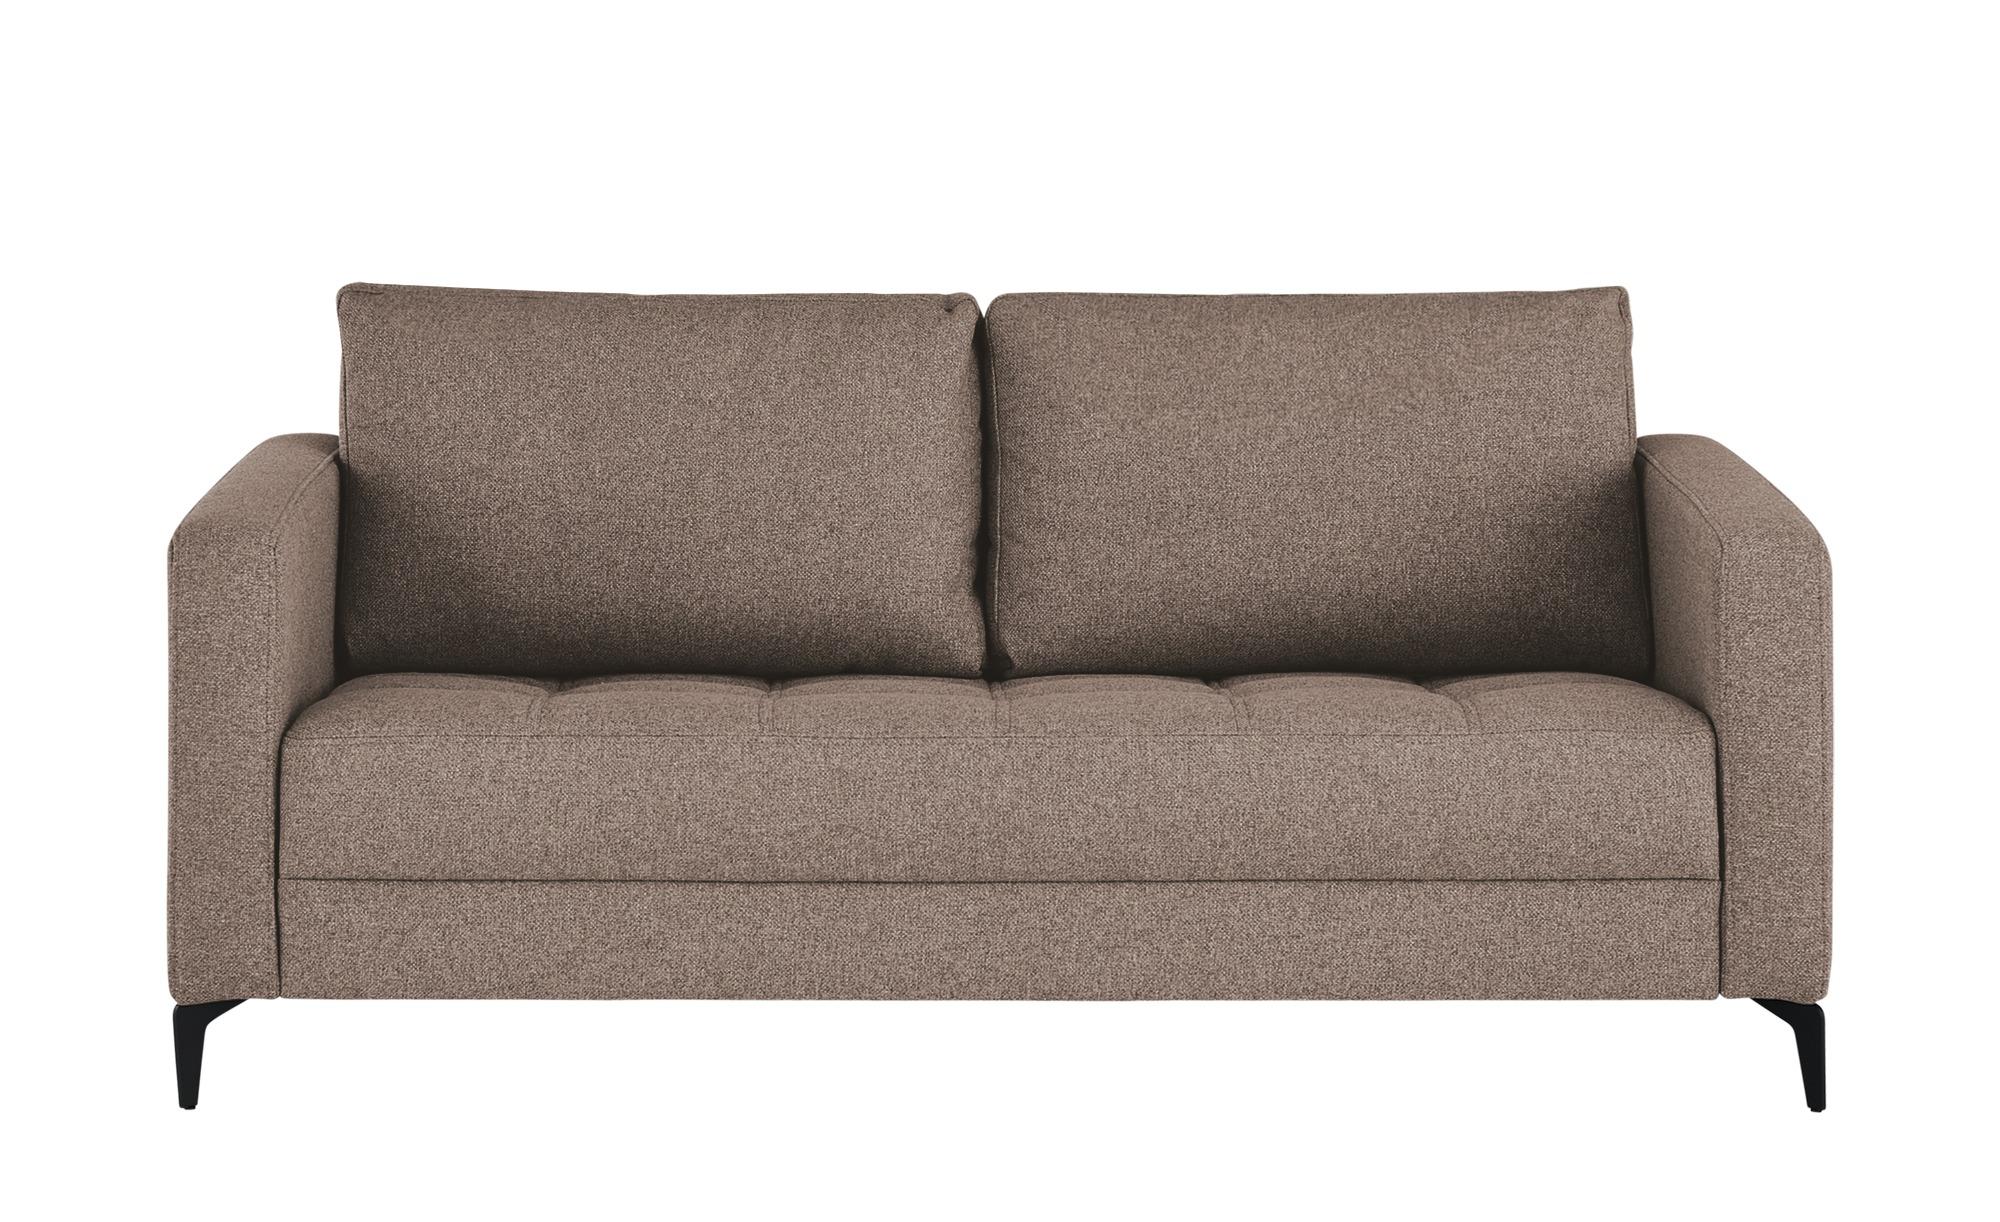 smart Sofa  Gesa ¦ braun ¦ Maße (cm): B: 178 H: 83 T: 91 Polstermöbel > Sofas > 2-Sitzer - Höffner